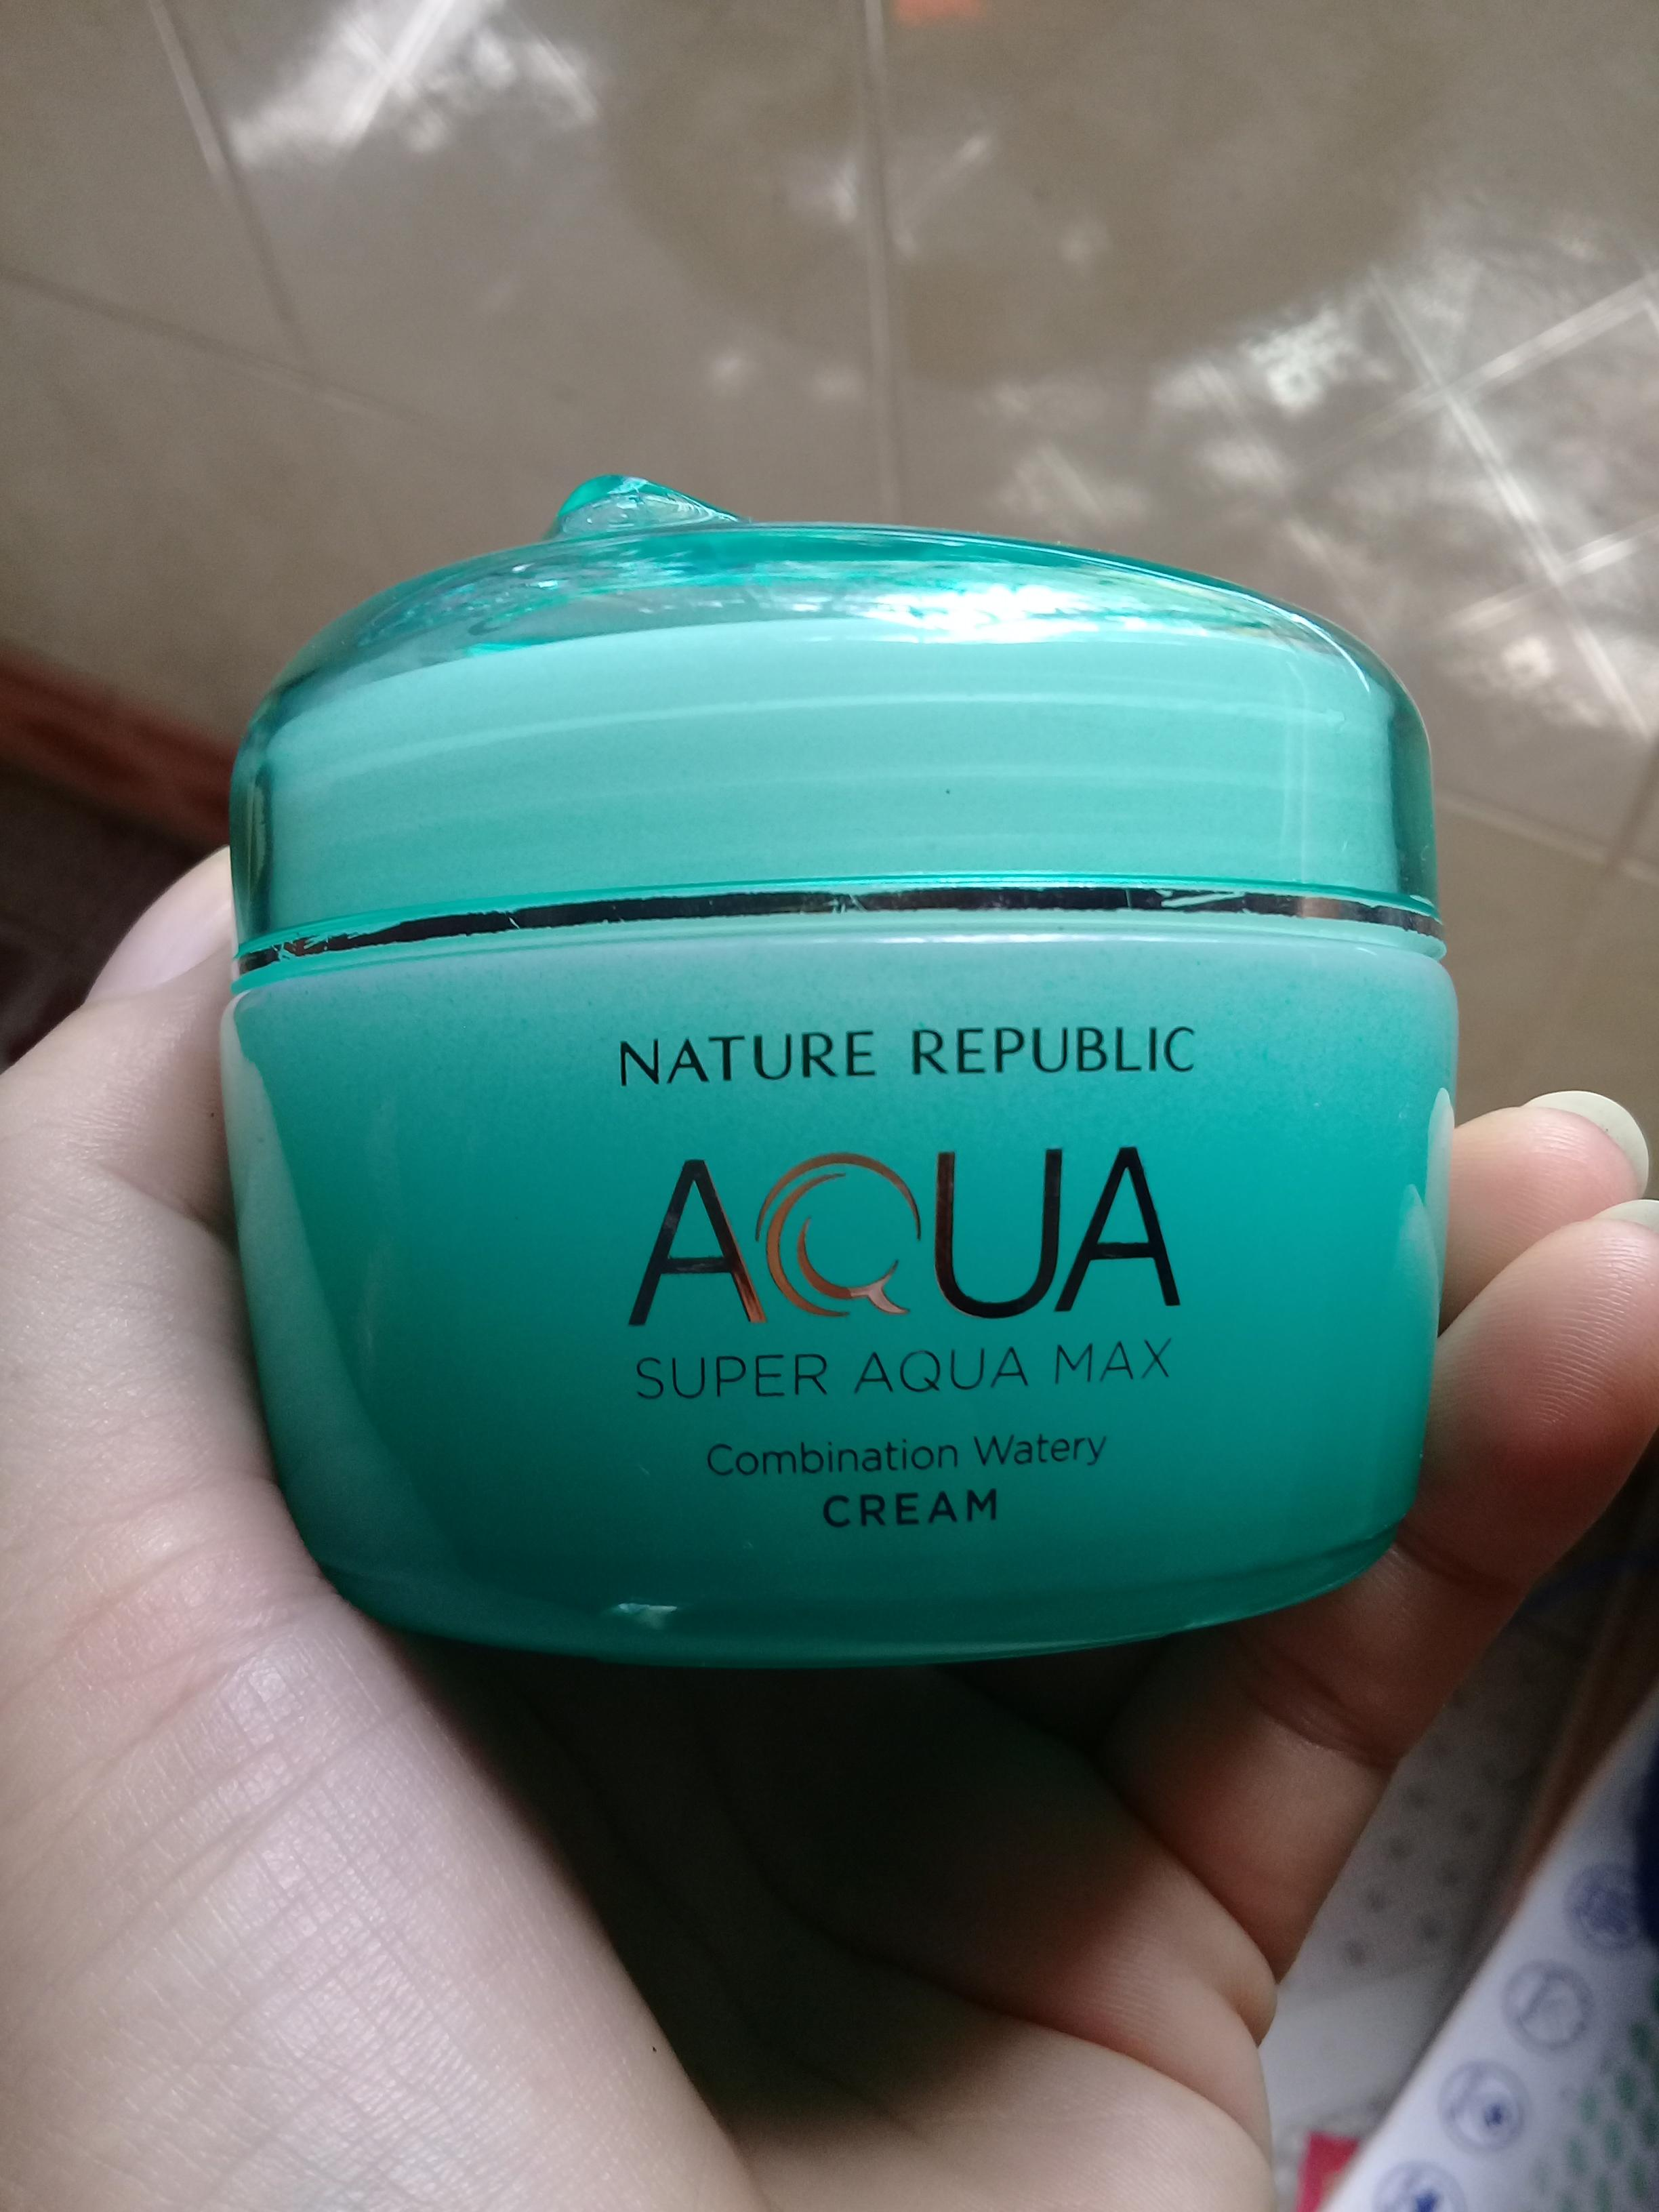 Nature Republicsuper Aqua Max Combination Watery Cream For Republic Himalaya Salt Cleansing Balm Pink 1542172695 1